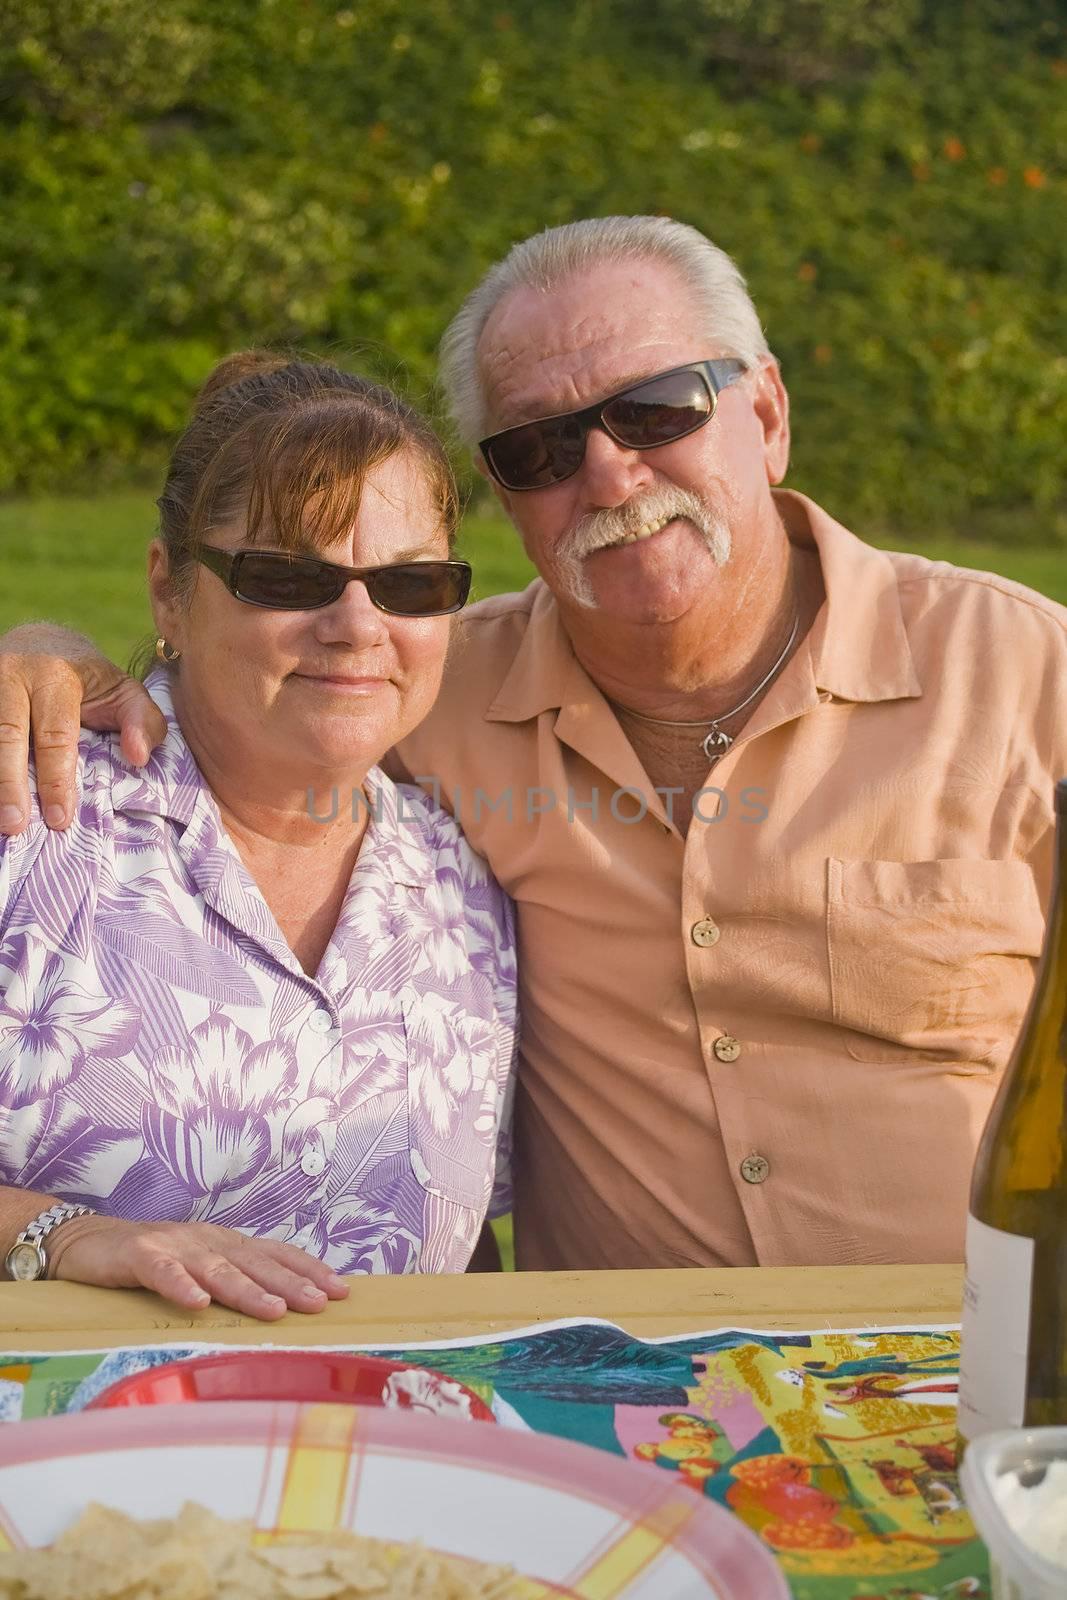 Senior Couple enjoys a Picnic outdoors Vertical Orientation